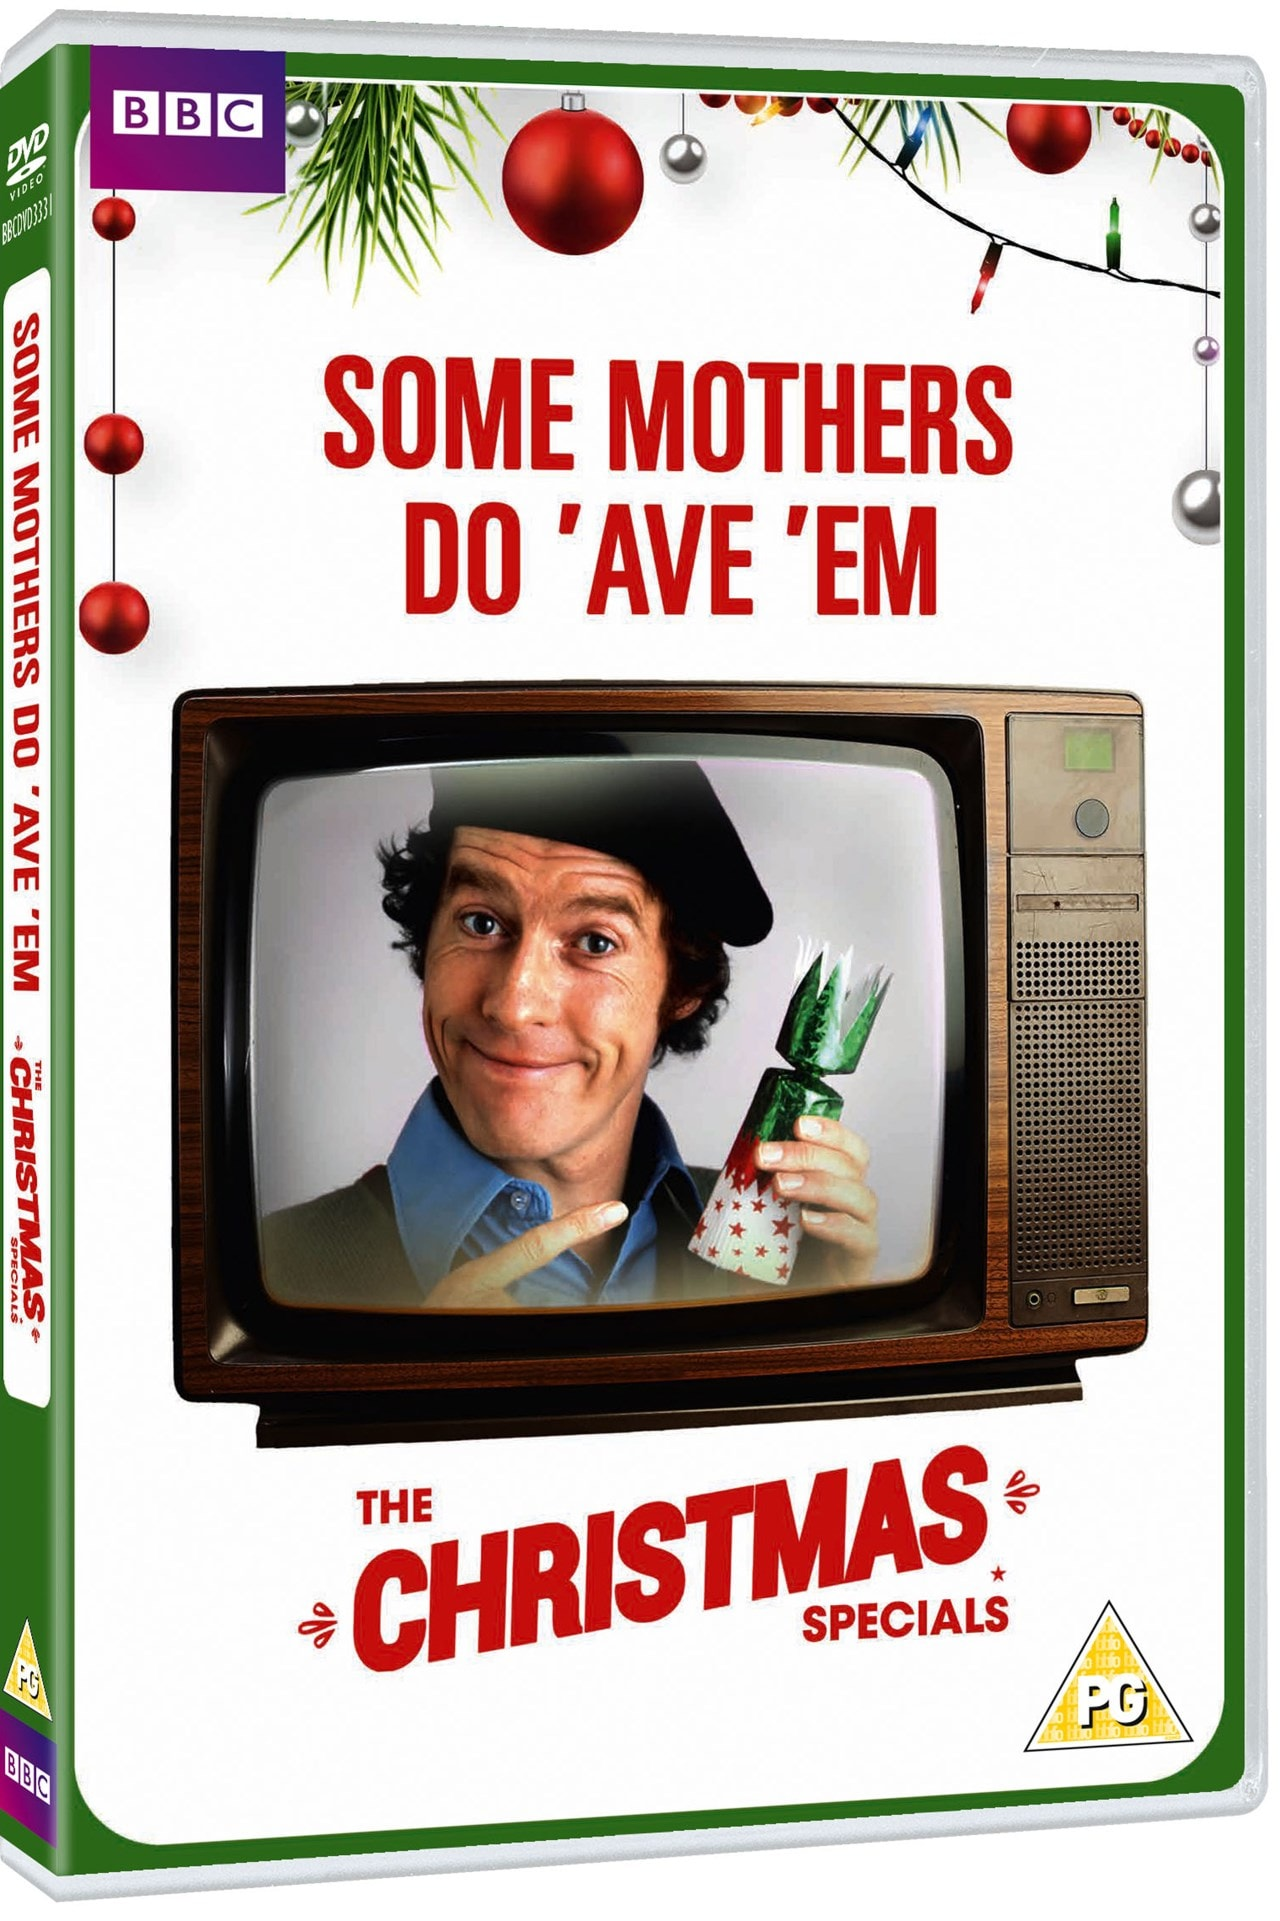 Some Mothers Do 'Ave 'Em: The Christmas Specials - 2